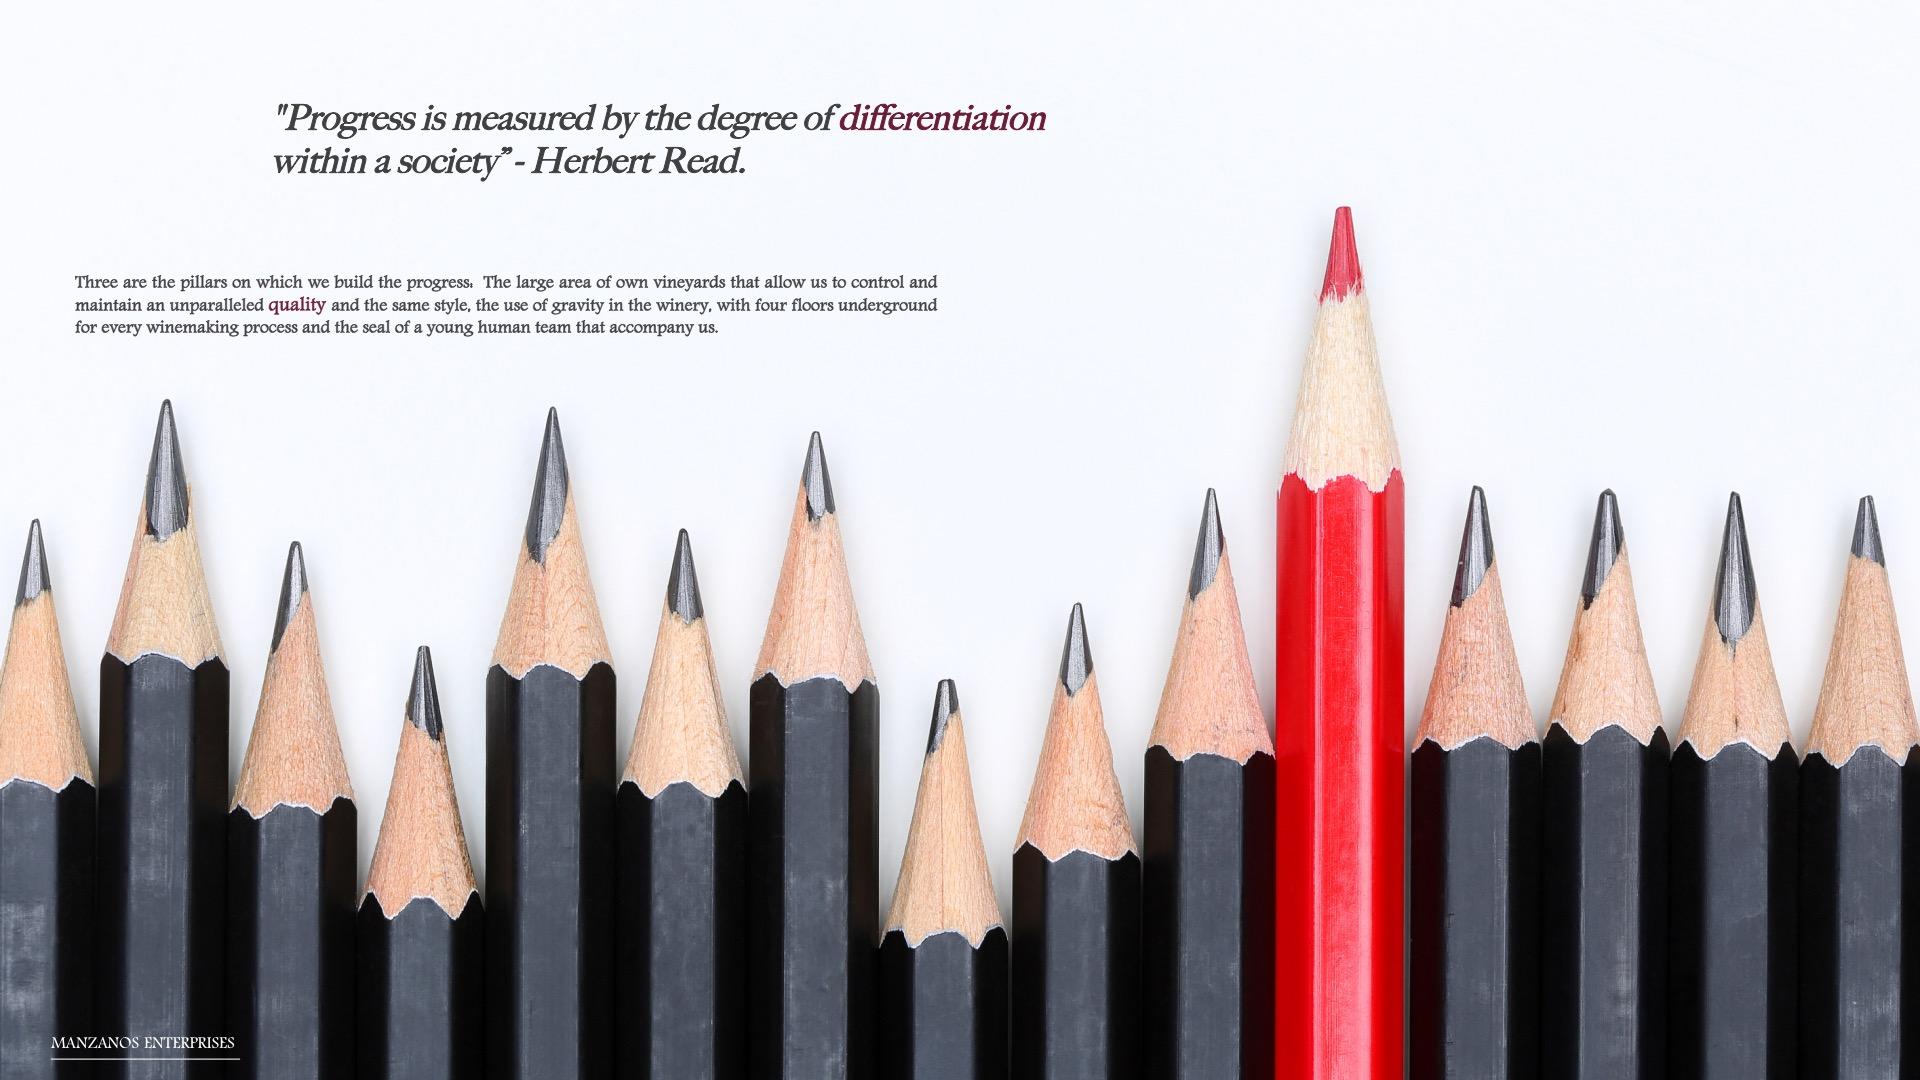 Differentation